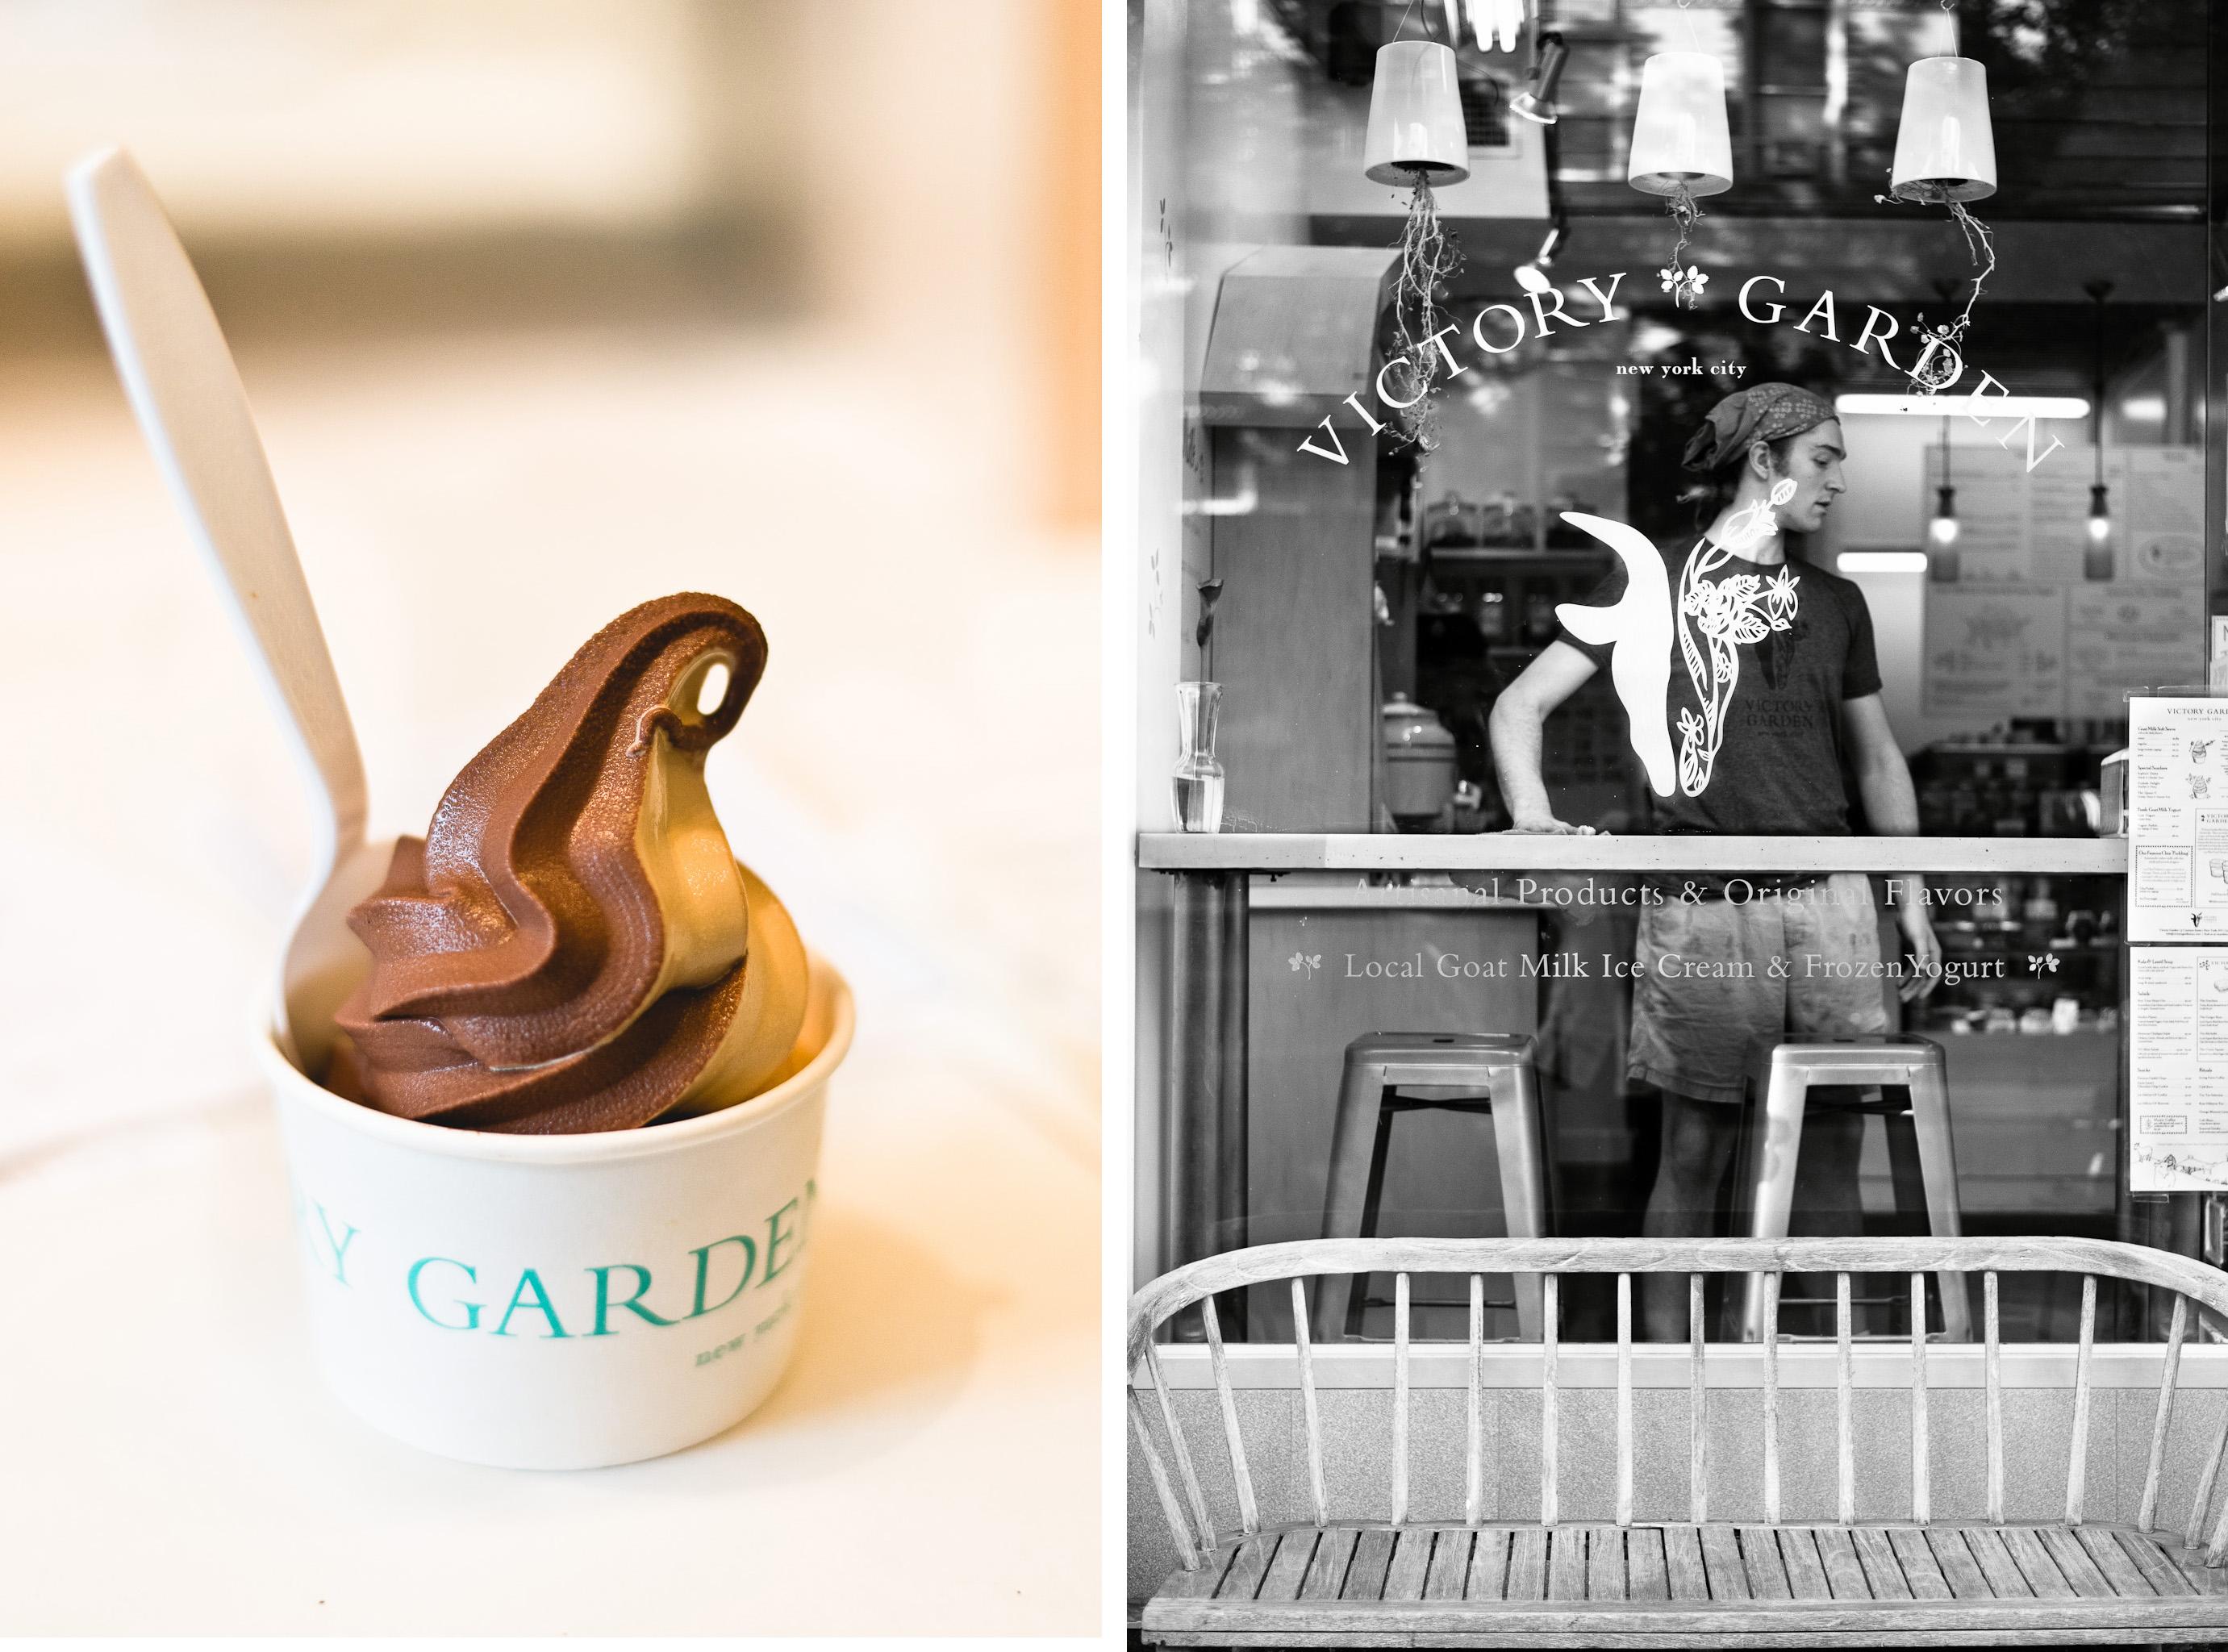 Victory Garden NYC: flavorsoflight